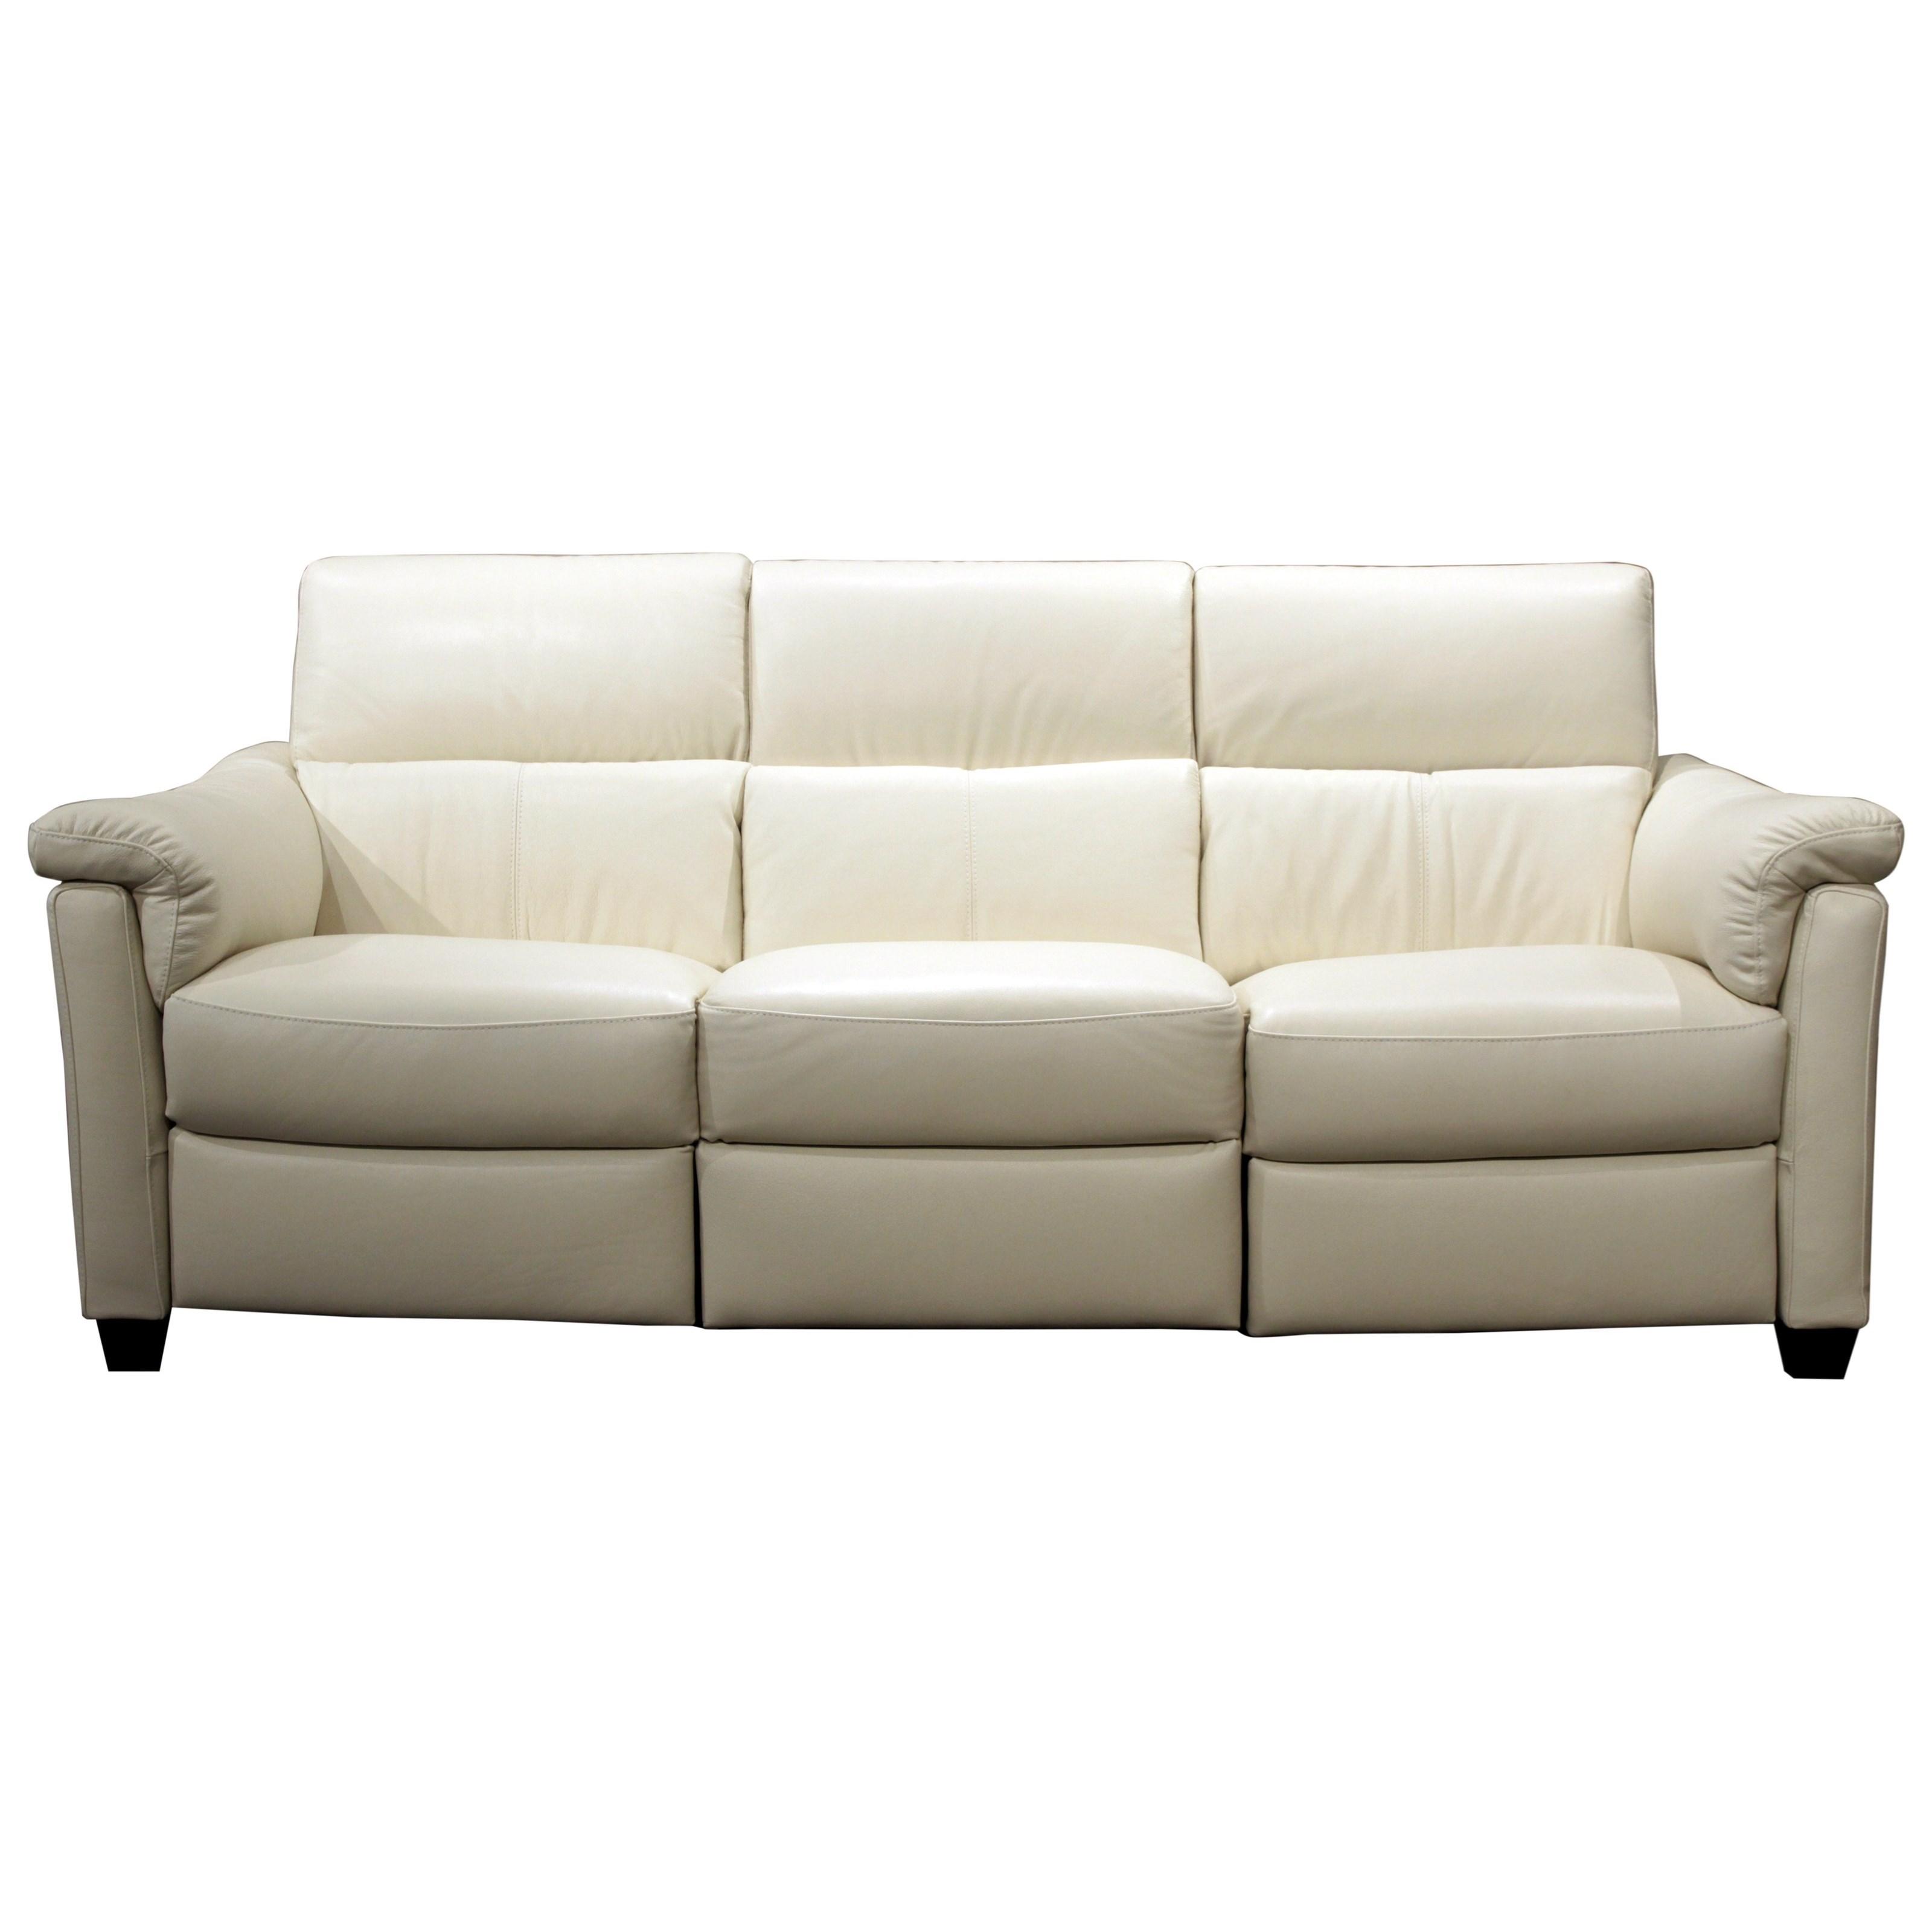 Astuzia Power Reclining Sofa by Natuzzi Editions at HomeWorld Furniture